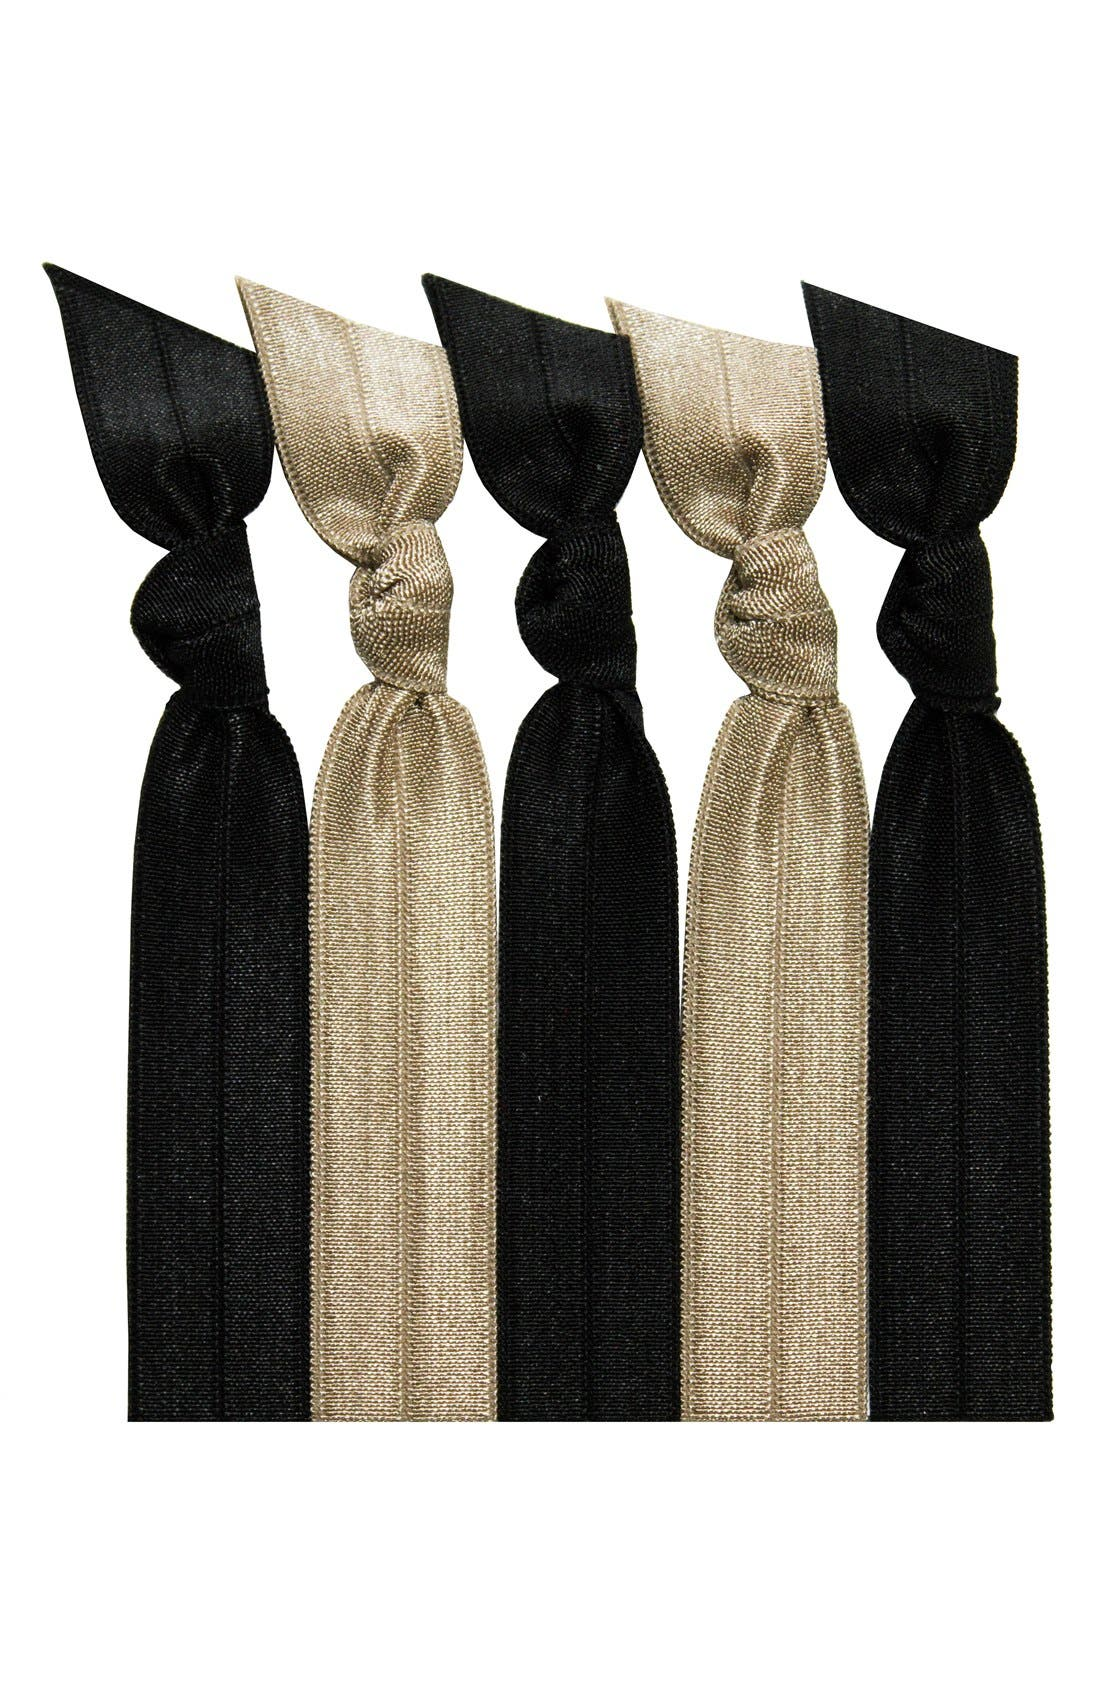 Main Image - Emi-Jay 'Pearl' Hair Ties (5-Pack) ($10.80 Value)